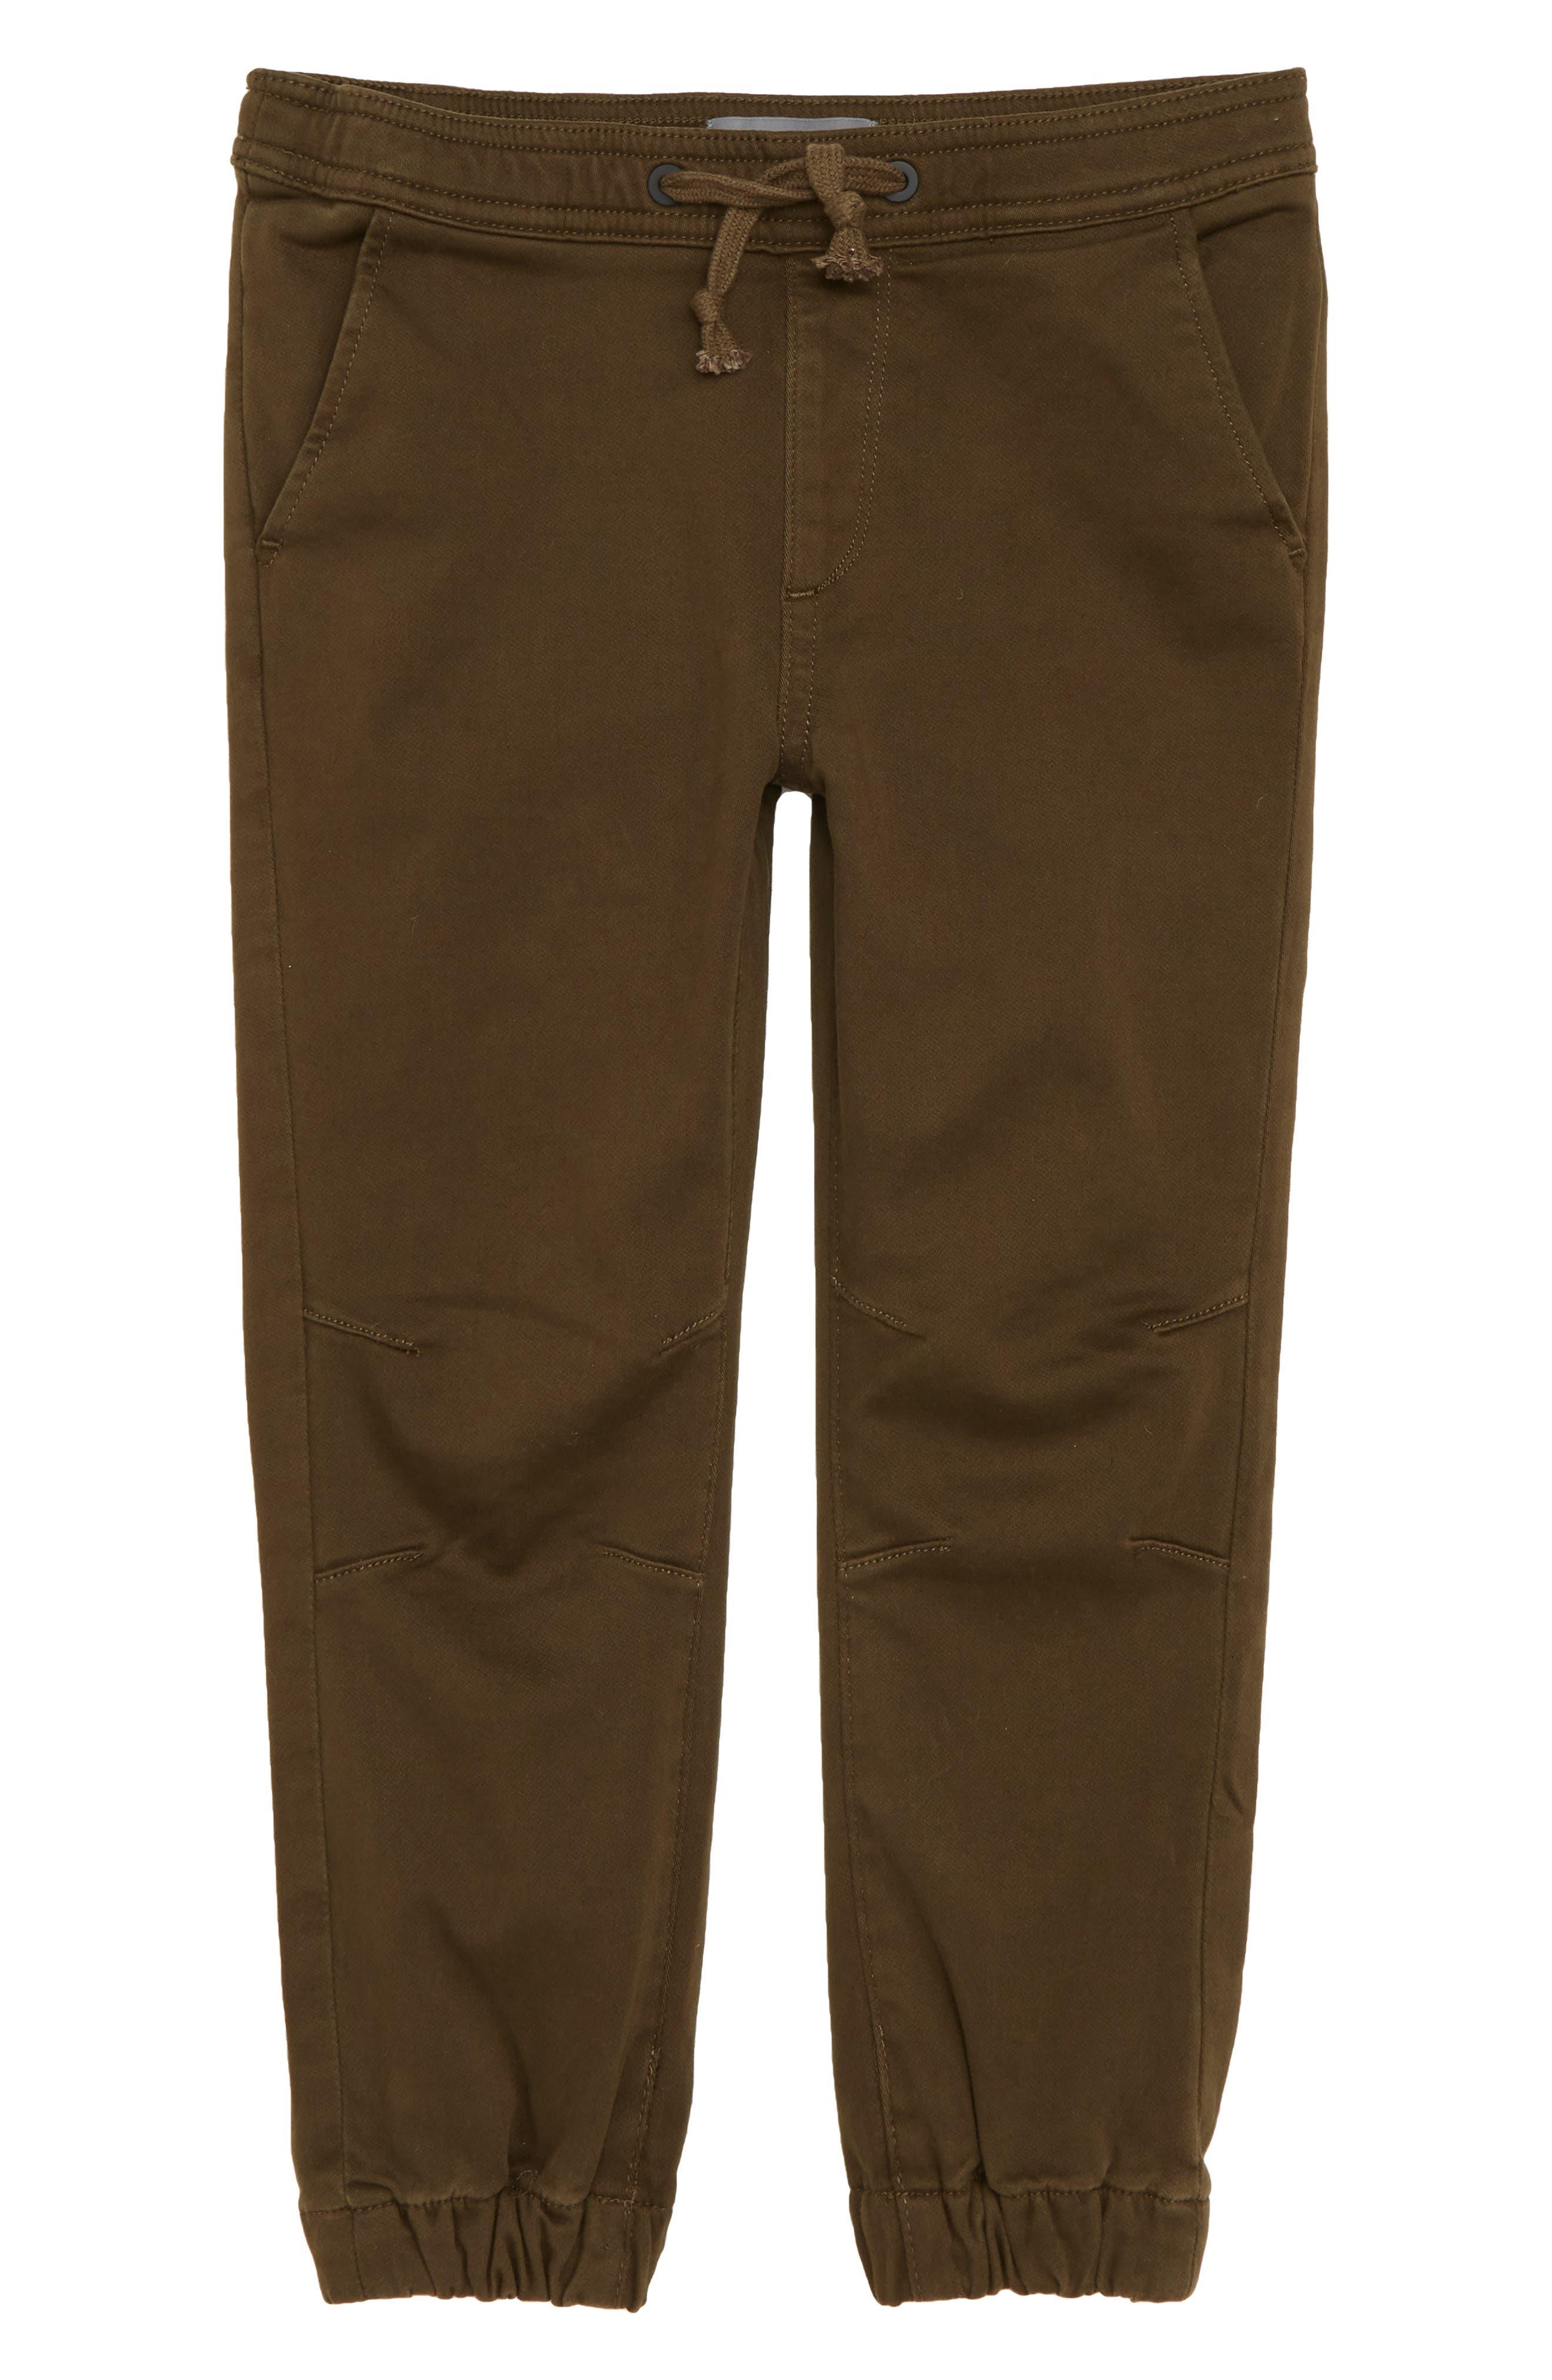 Jackson Knit Jogger Pants,                             Main thumbnail 1, color,                             300